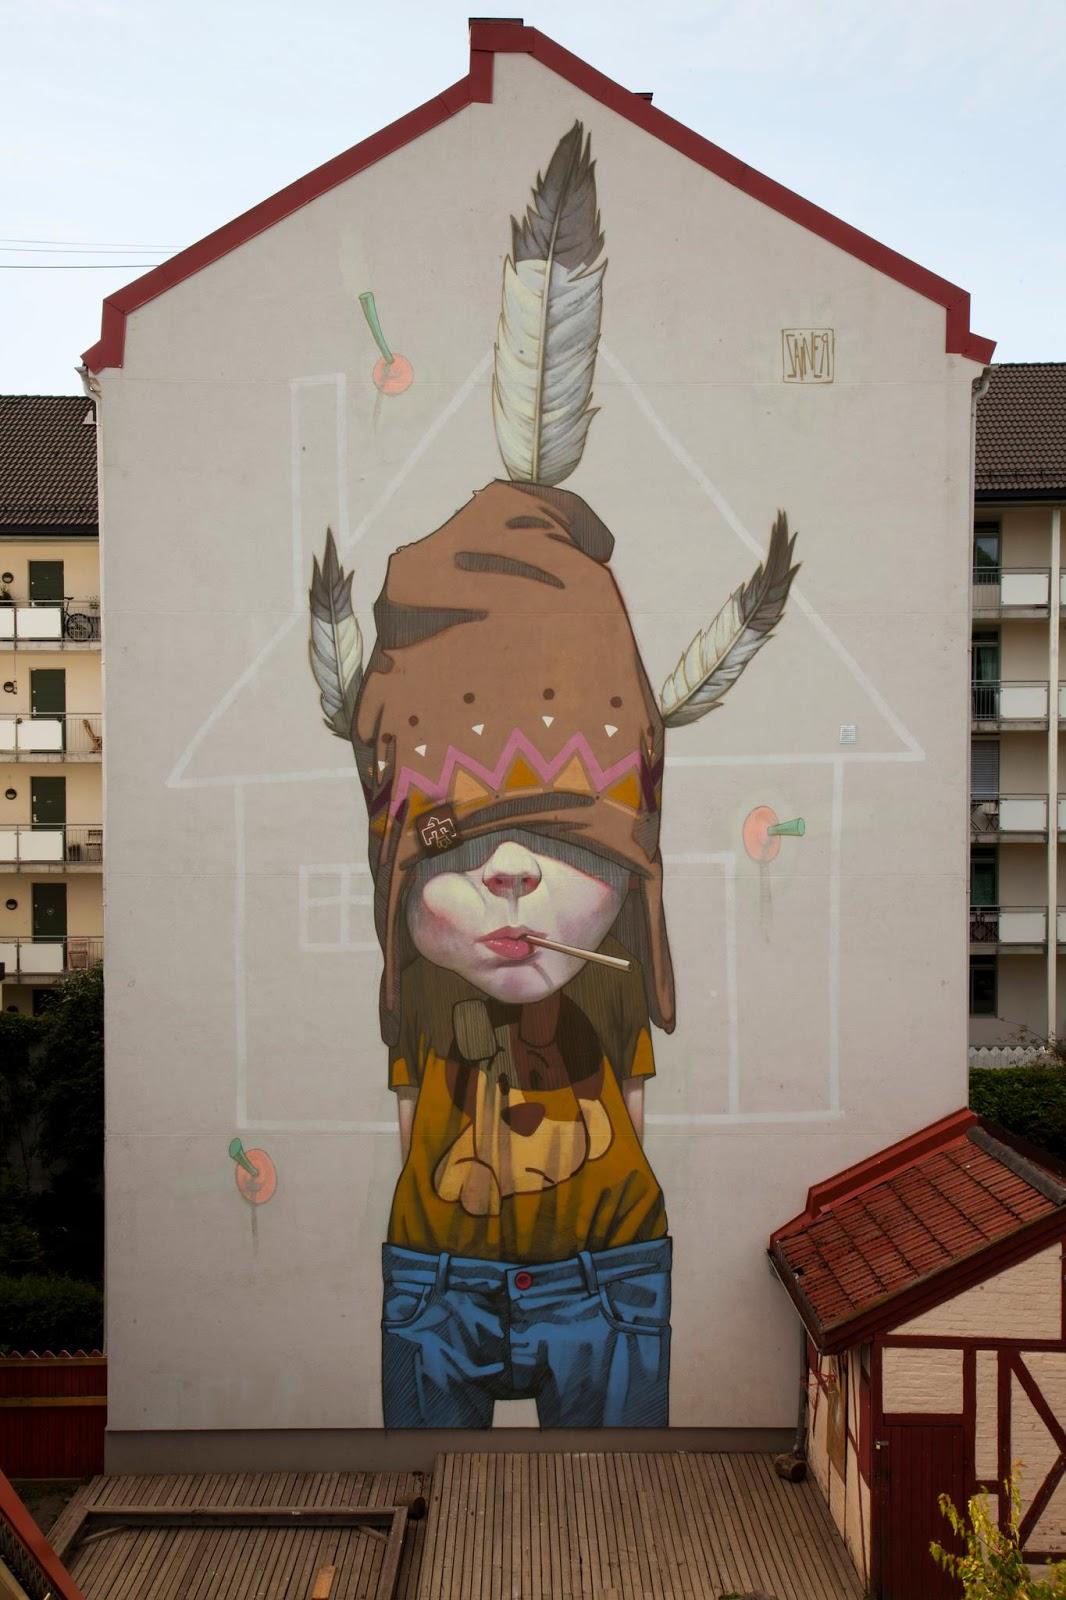 etam-cru-bezt-sainer-street-art-large-murals-23